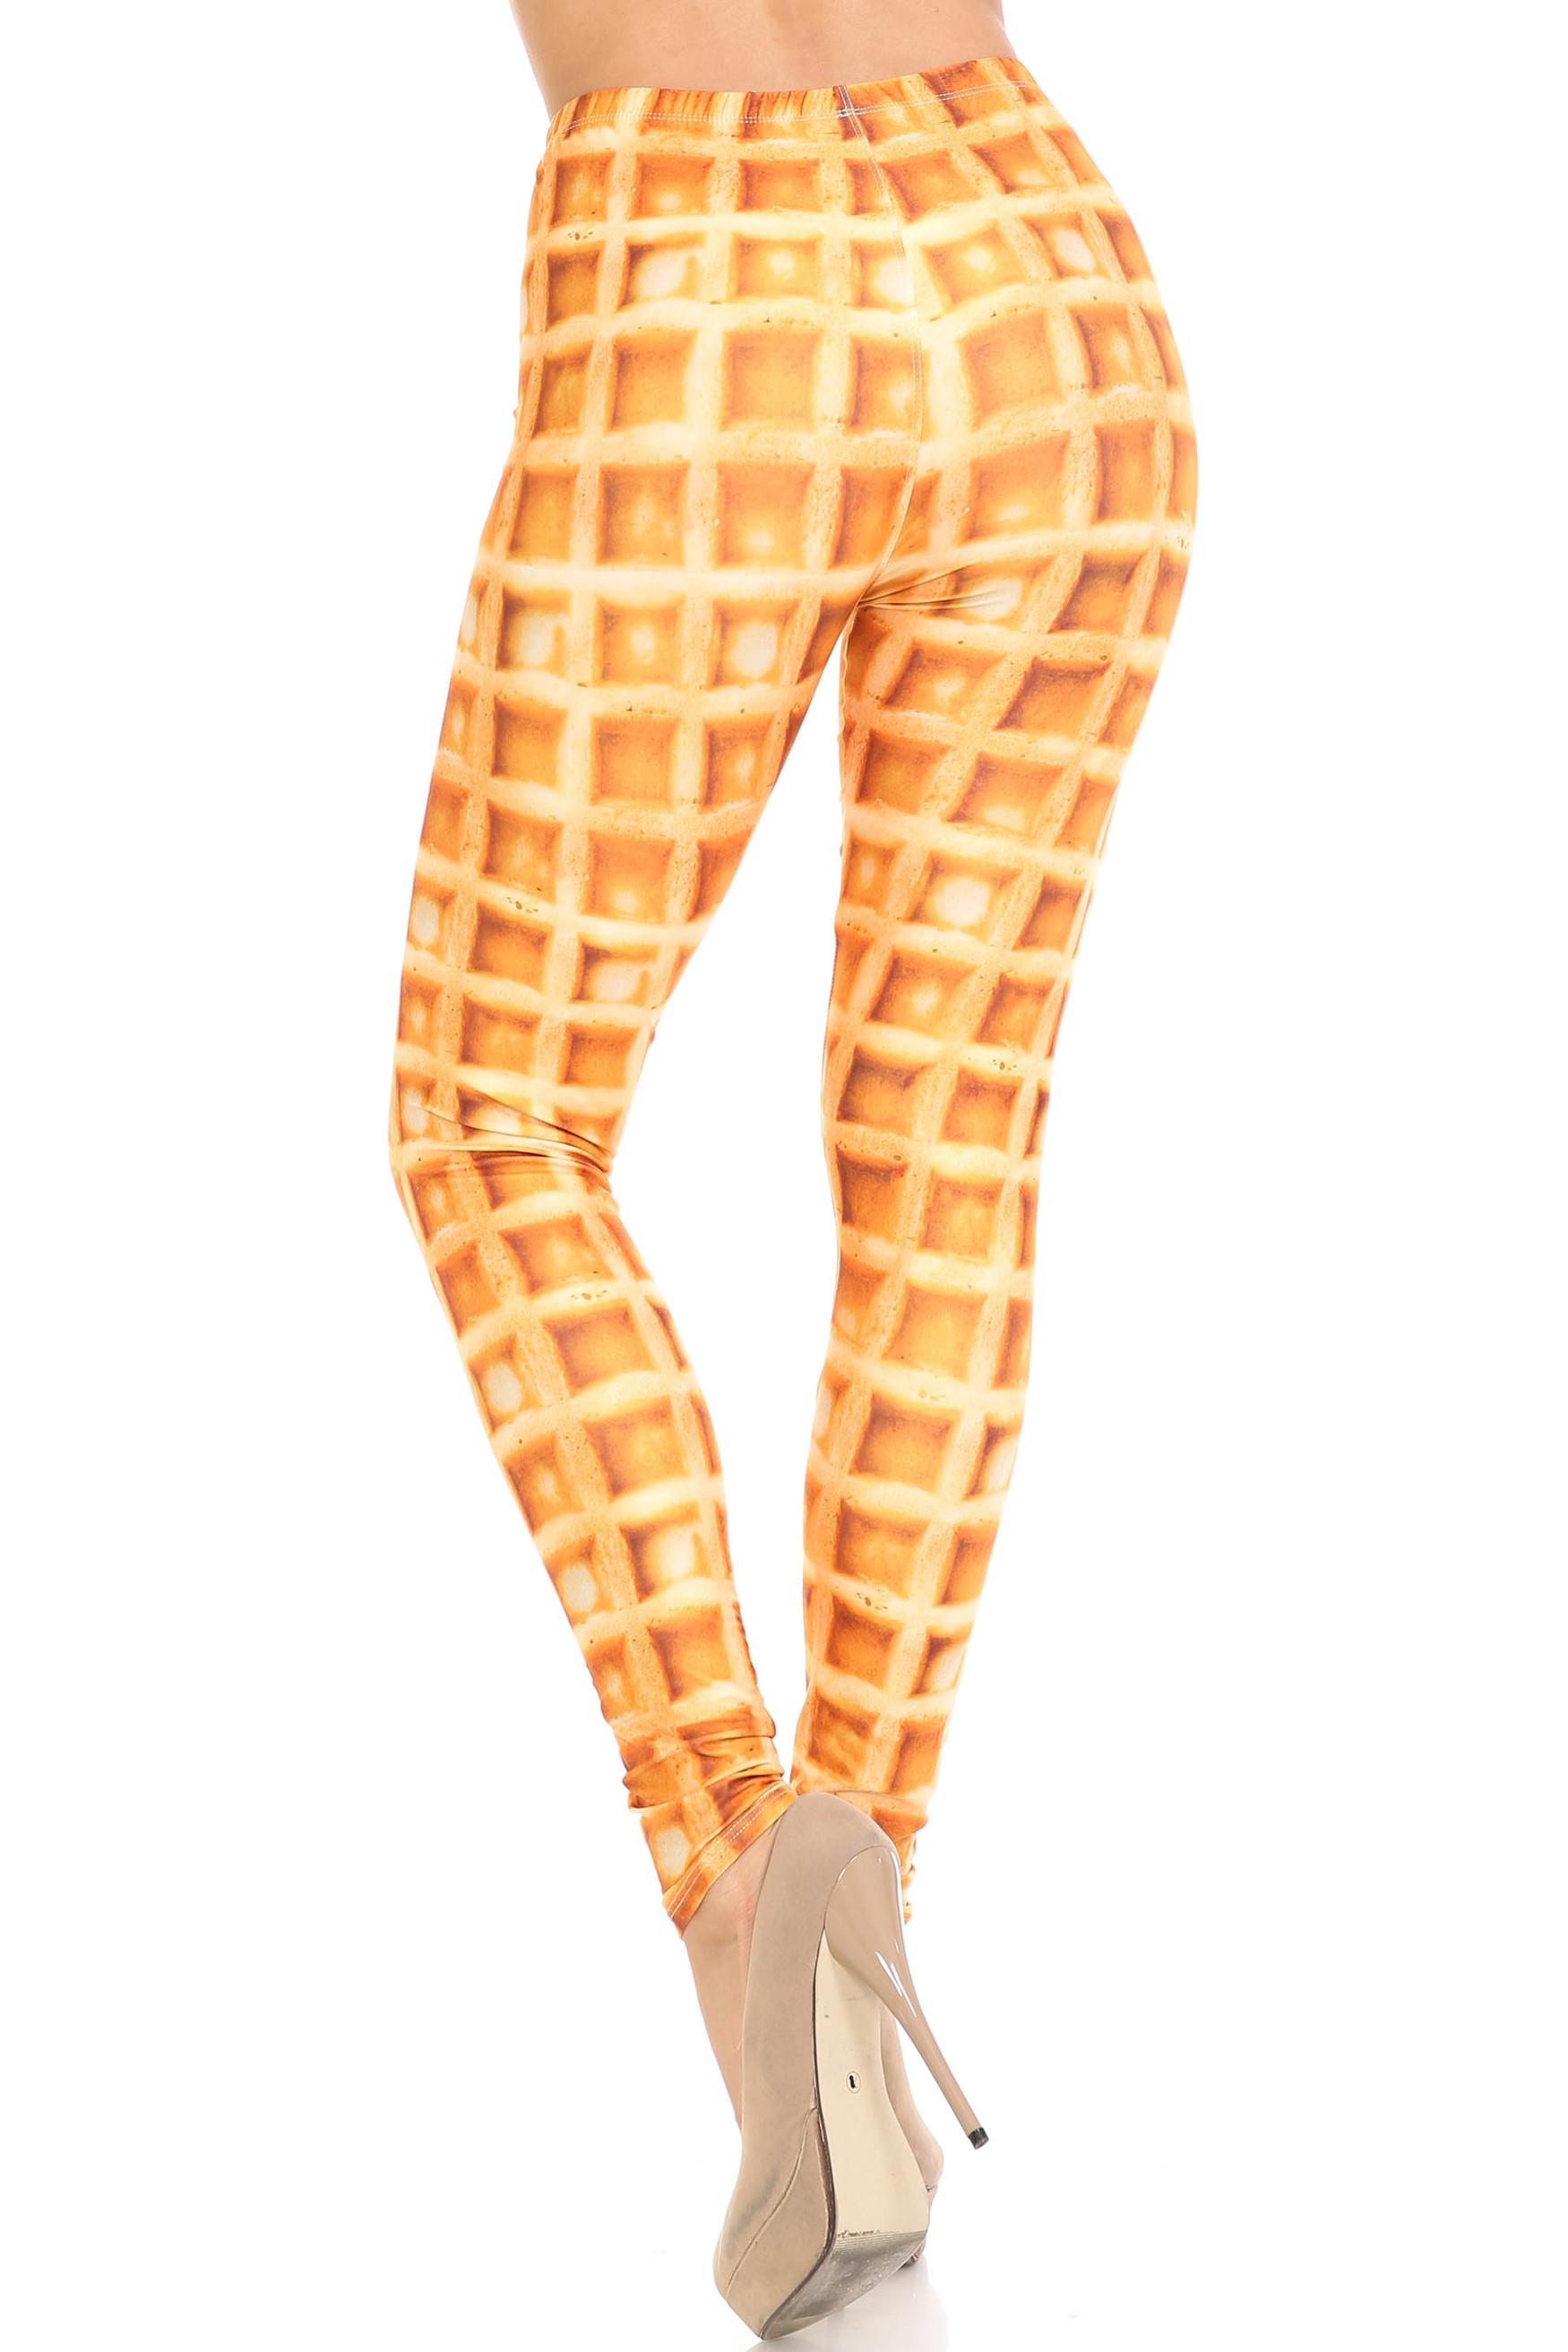 Creamy Soft Waffle Plus Size Leggings - By USA Fashion™